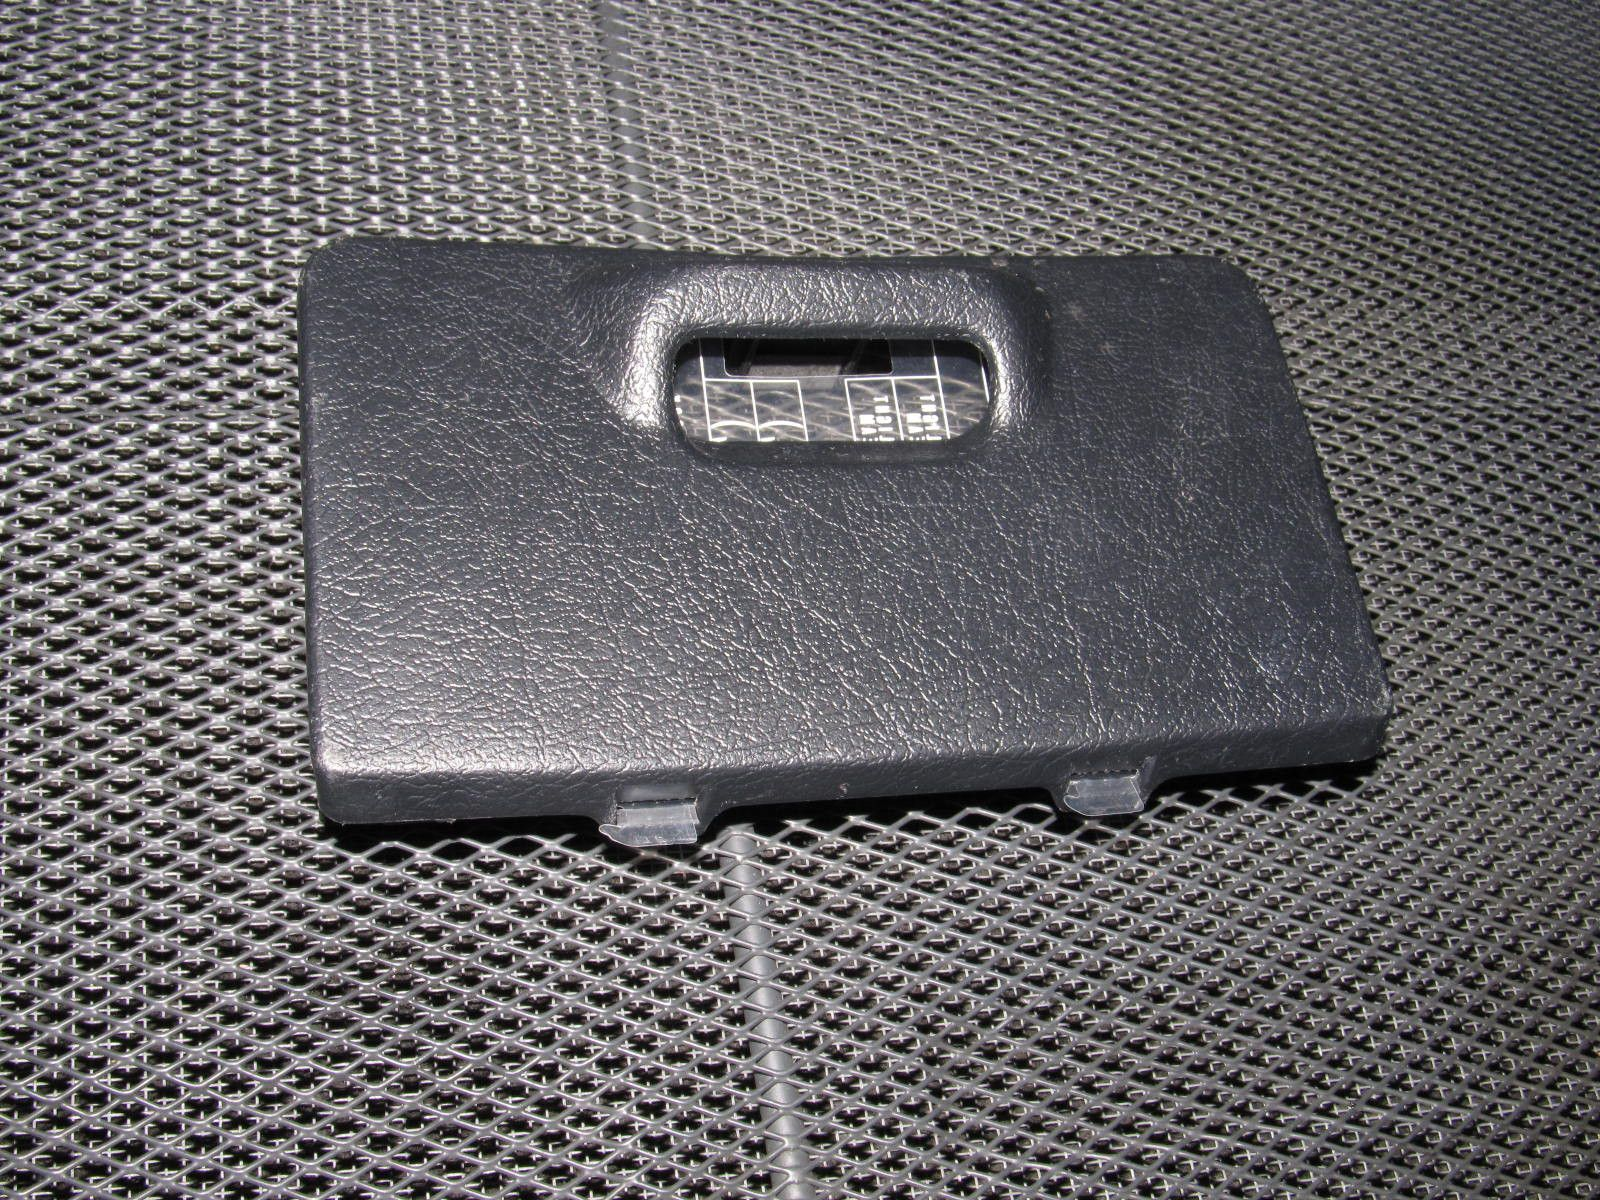 94 95 96 97 98 99 00 01 acura integra oem interior fuse box cover  91 92 93 94 nissan 240sx oem interior fuse box cover autopartone #7